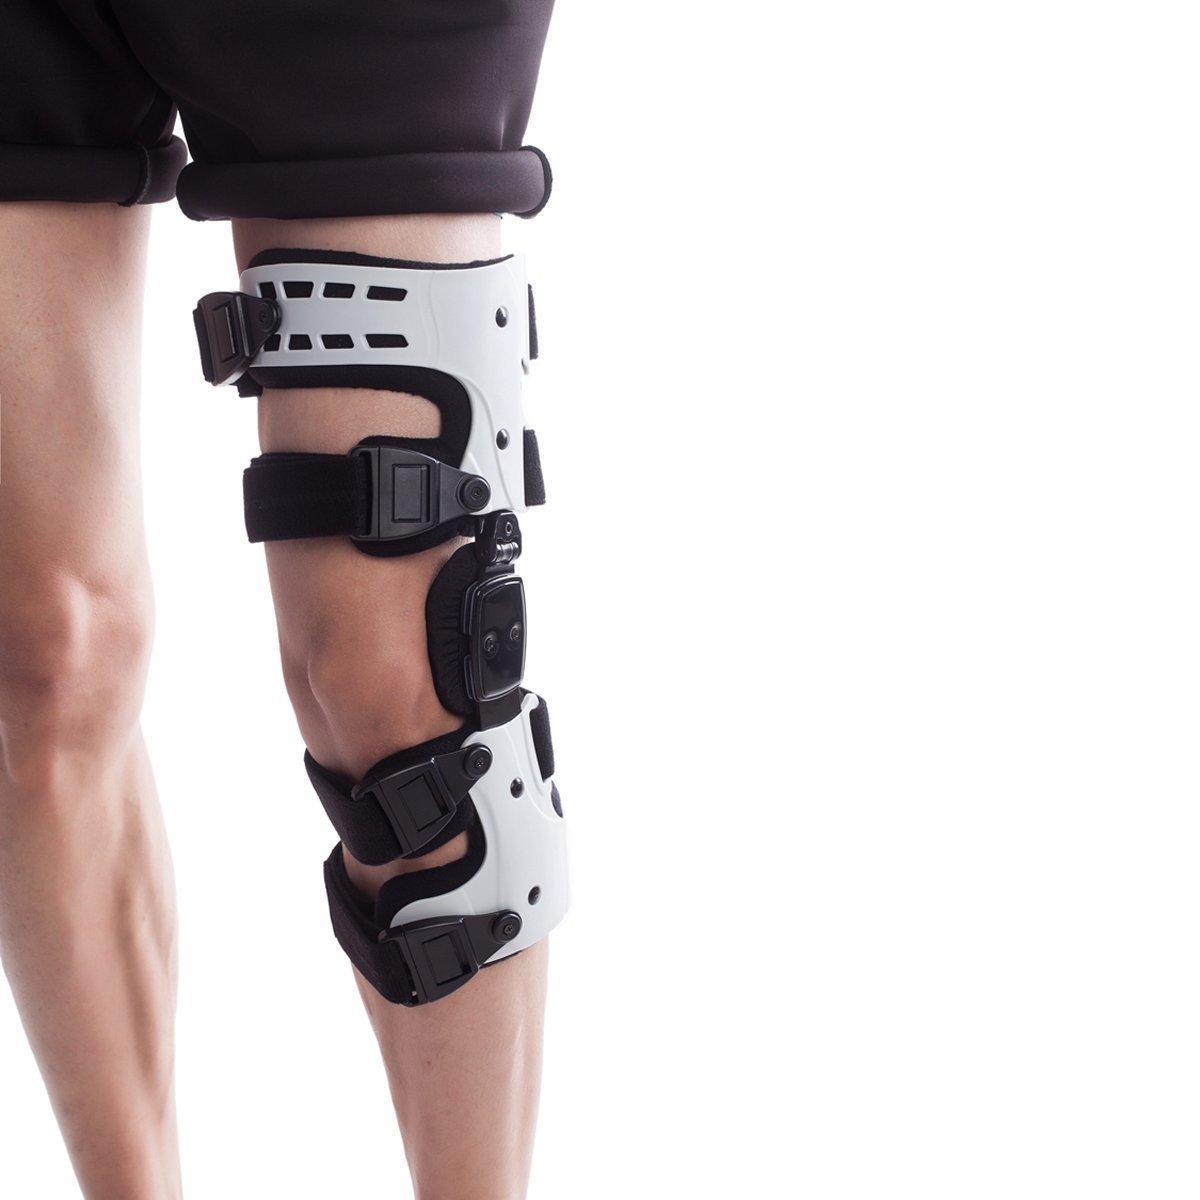 Orthomen OA Unloading Knee Brace for Osteoarthritis – Bone on Bone - Lateral Support - Size: Universal/Left by Orthomen (Image #1)